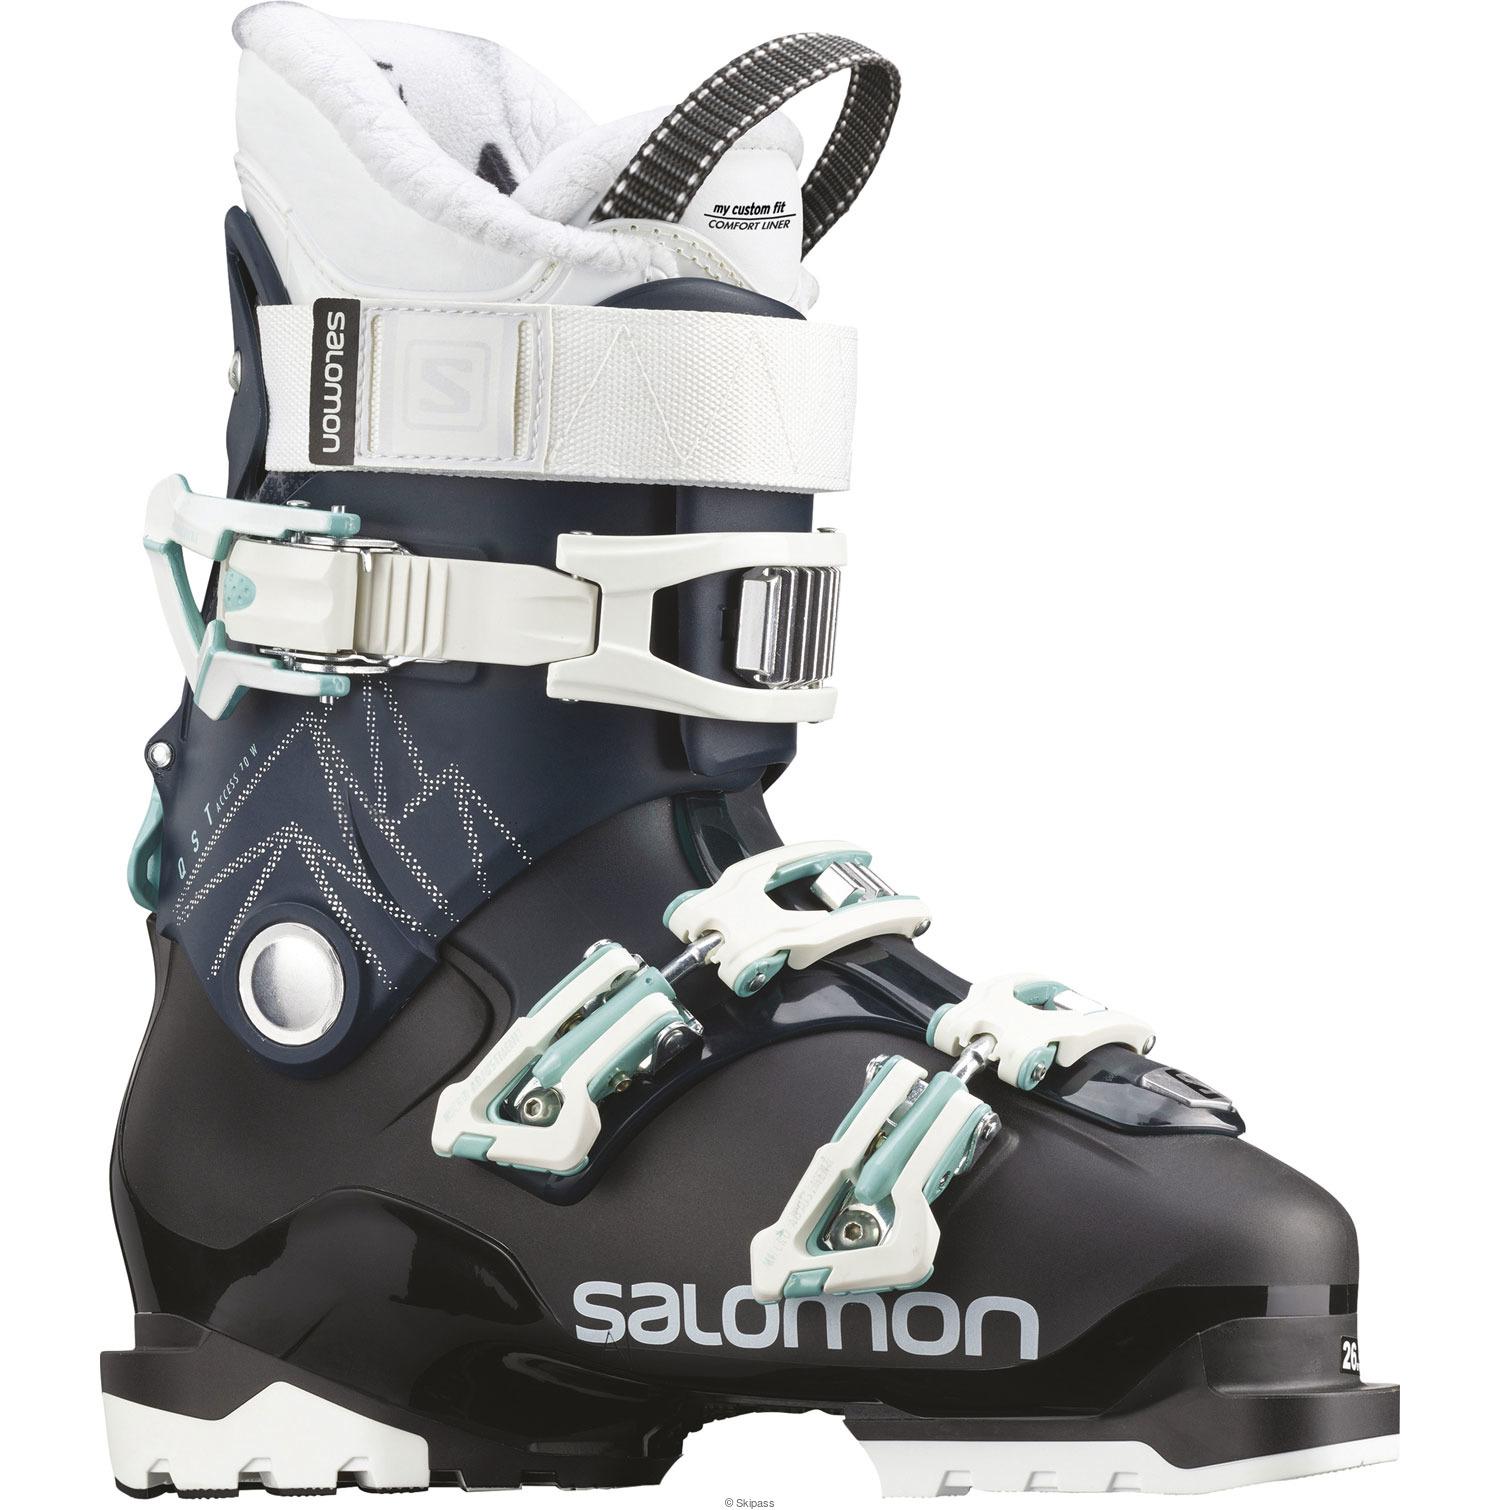 Test chaussure ski Salomon QST Access 70 W 2020, avis